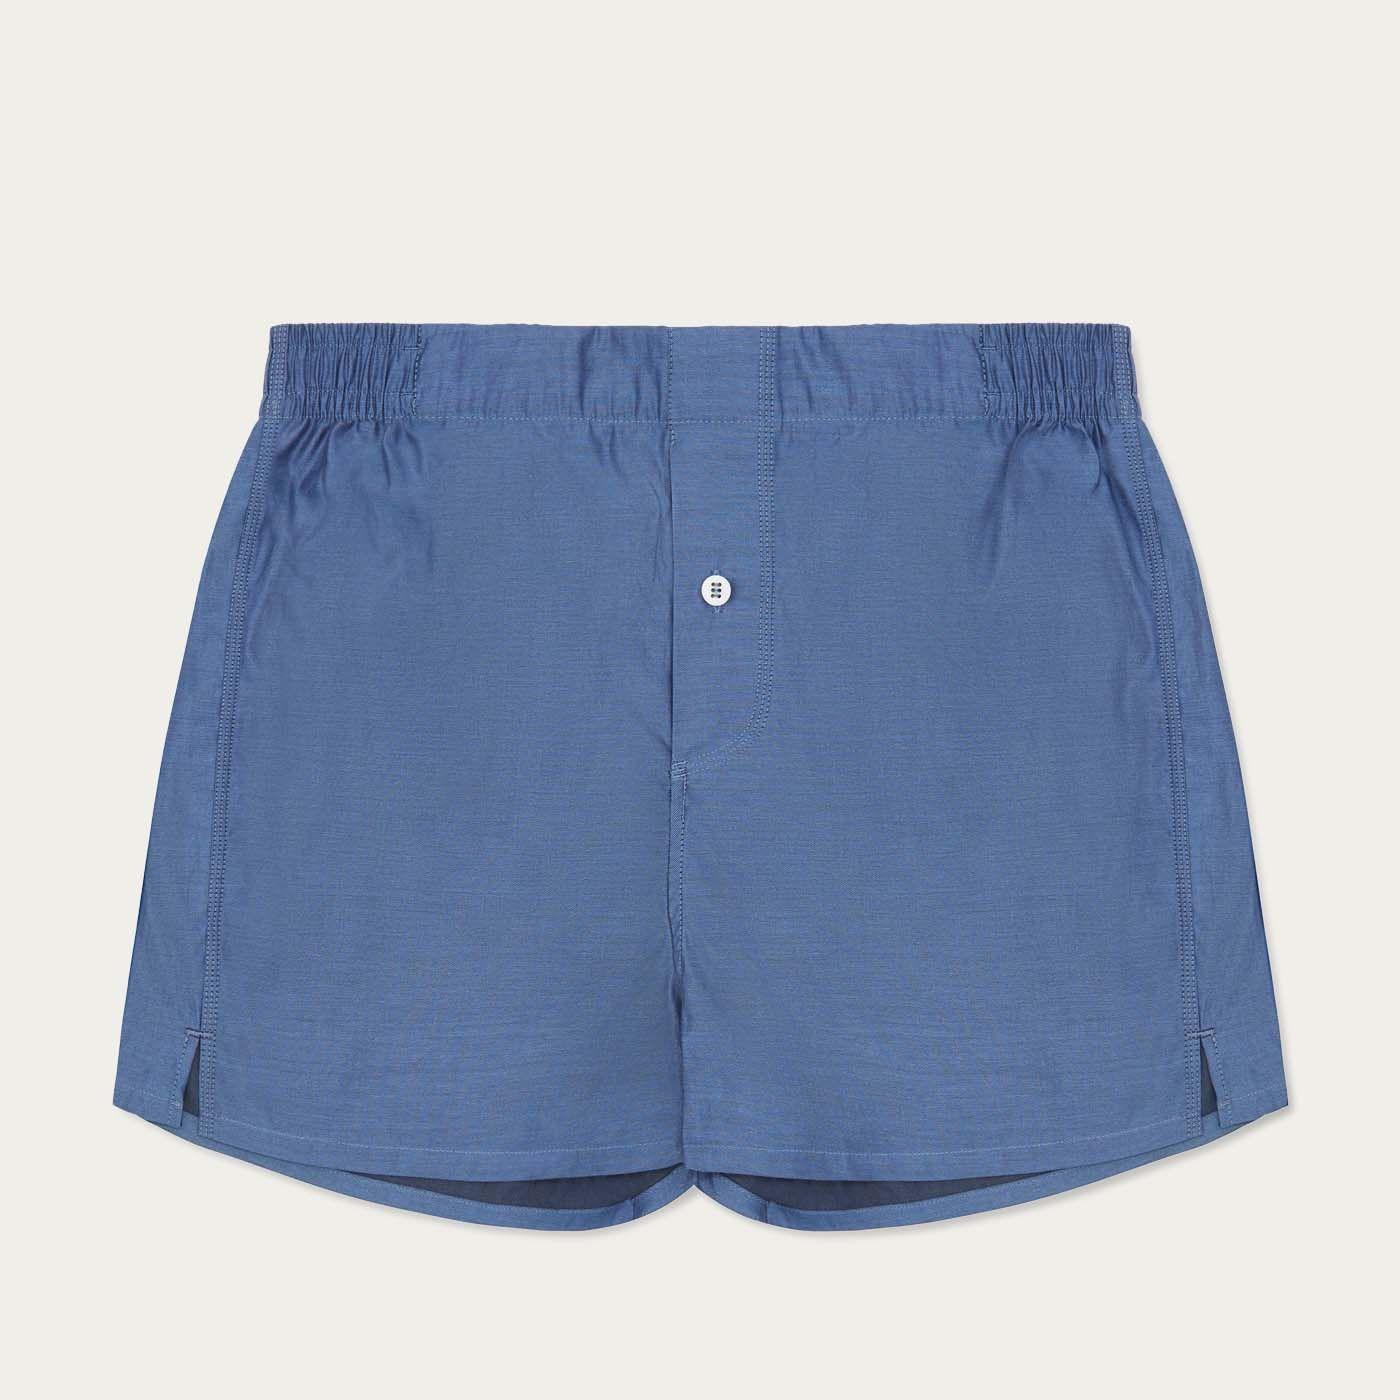 Navy Jersey Boxer Short 0